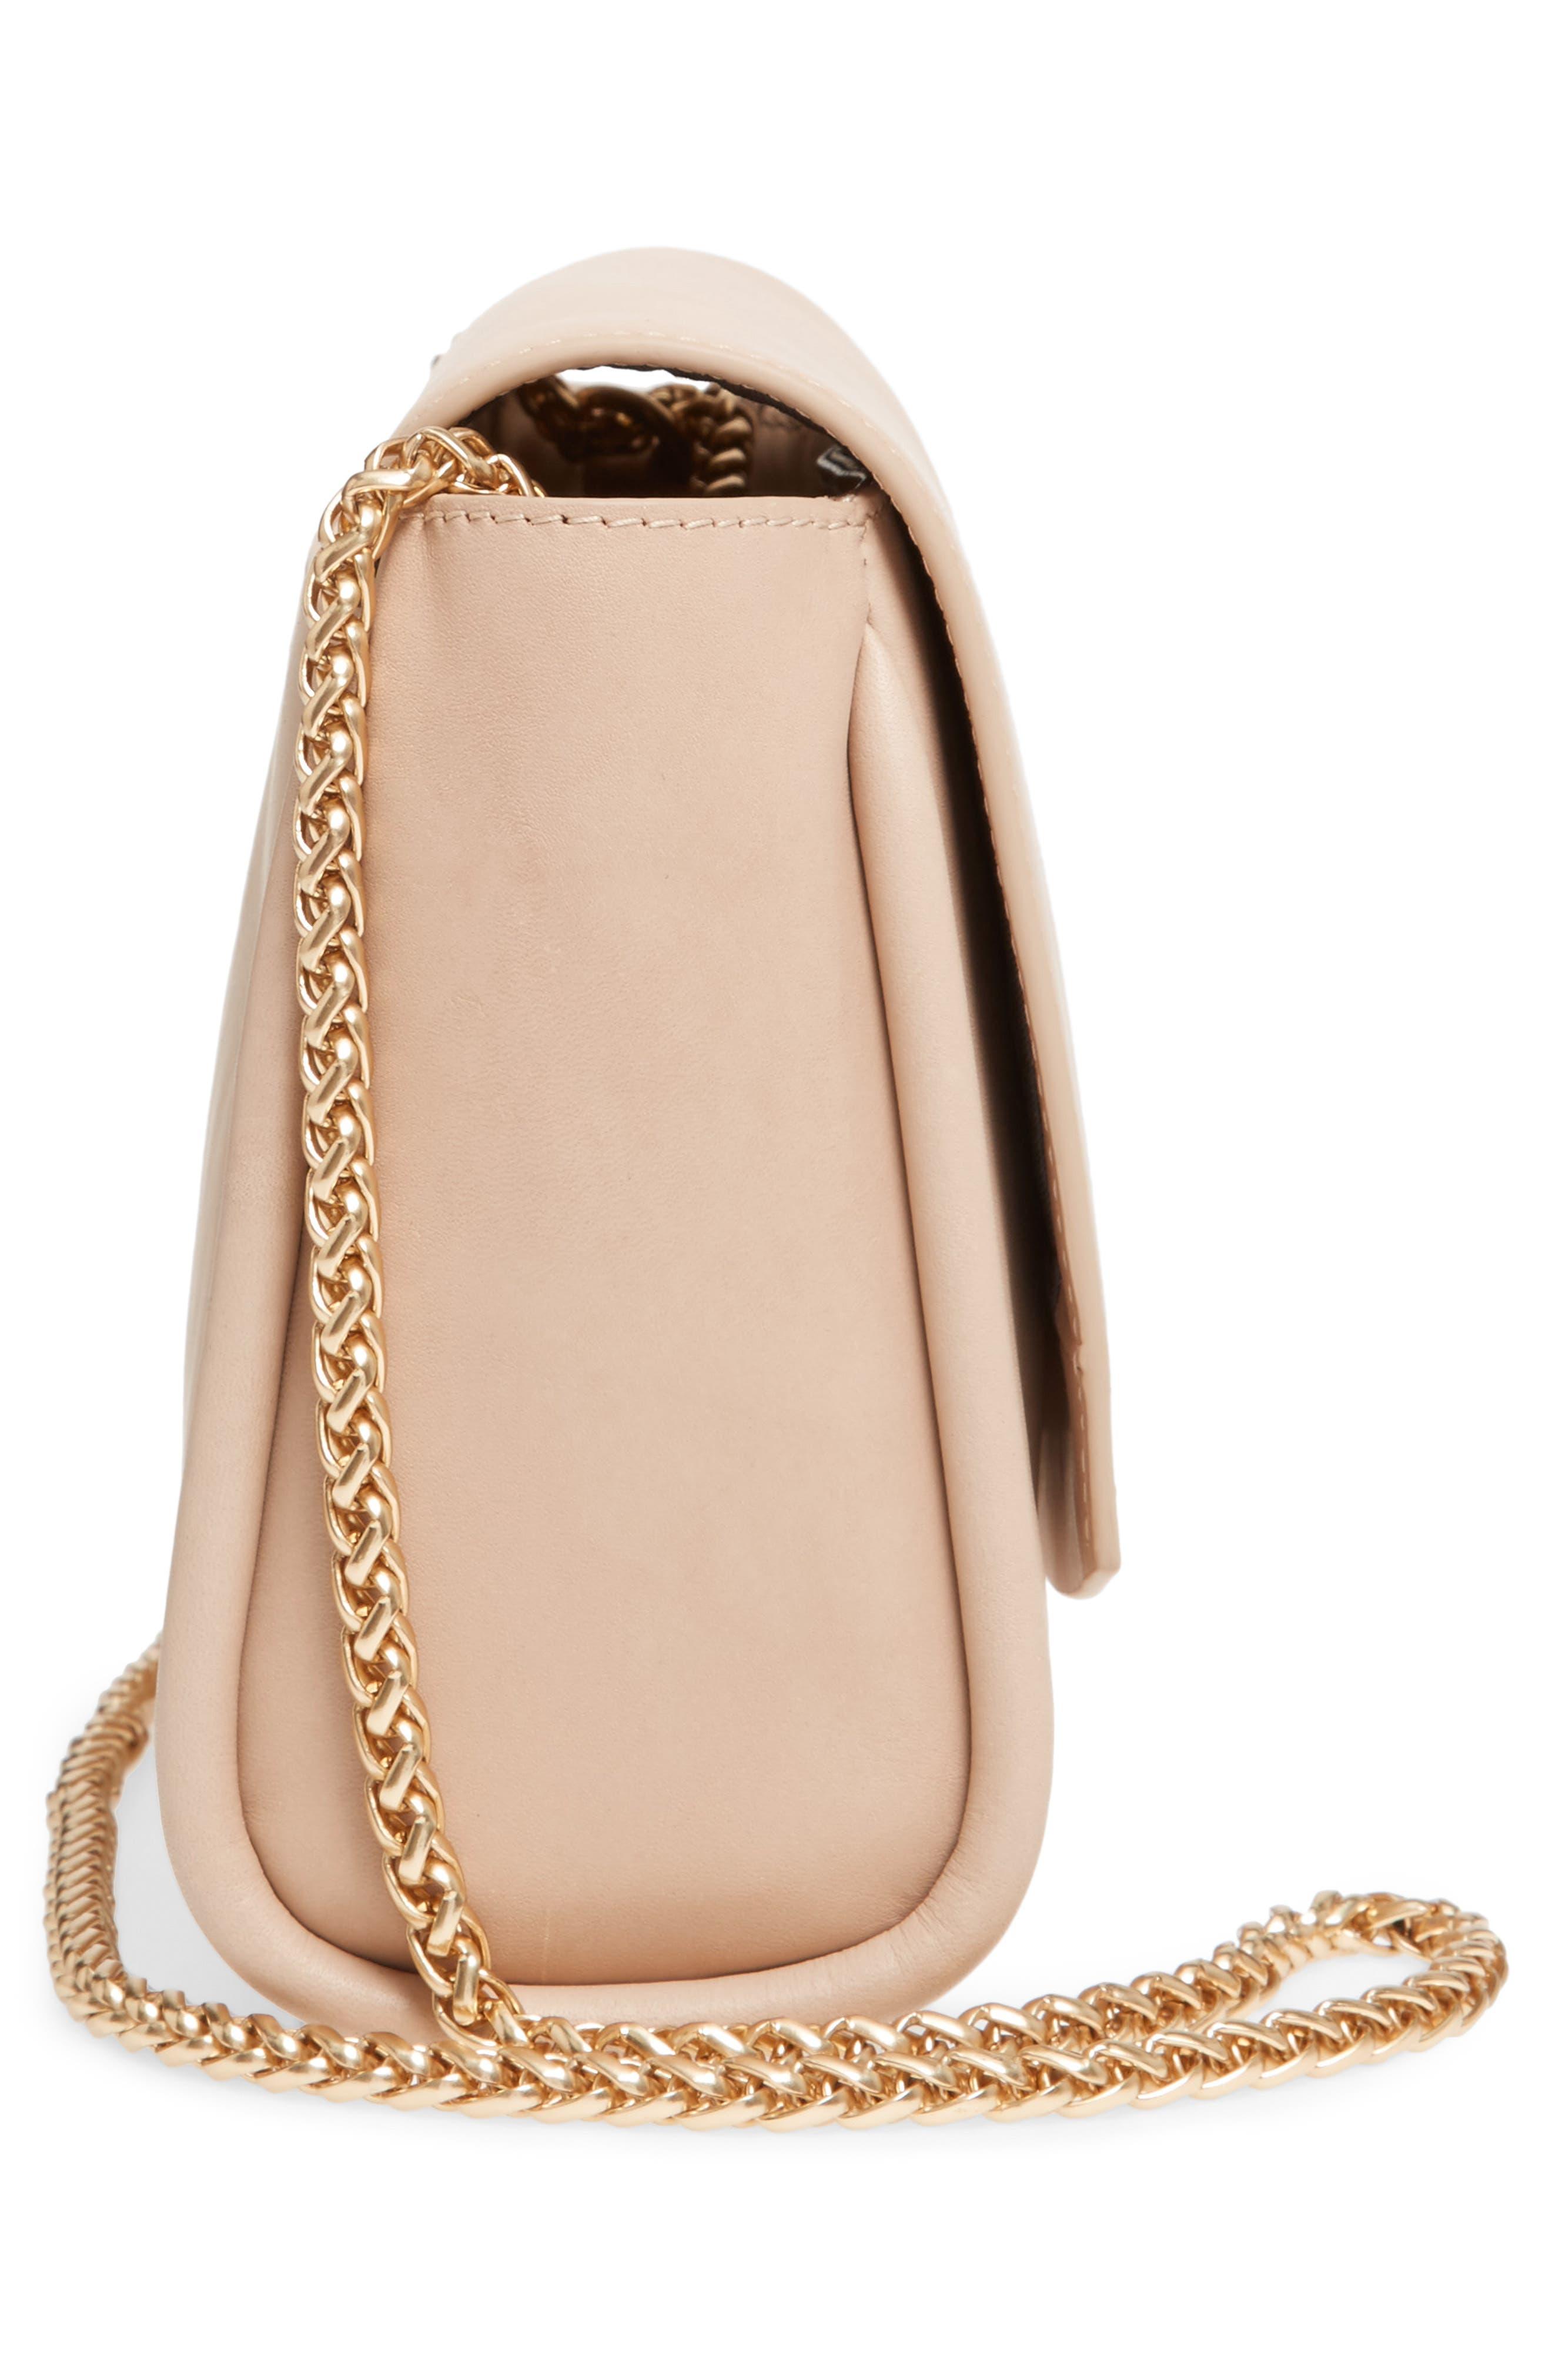 Sylvi Calfskin Leather Crossbody Bag,                             Alternate thumbnail 5, color,                             251